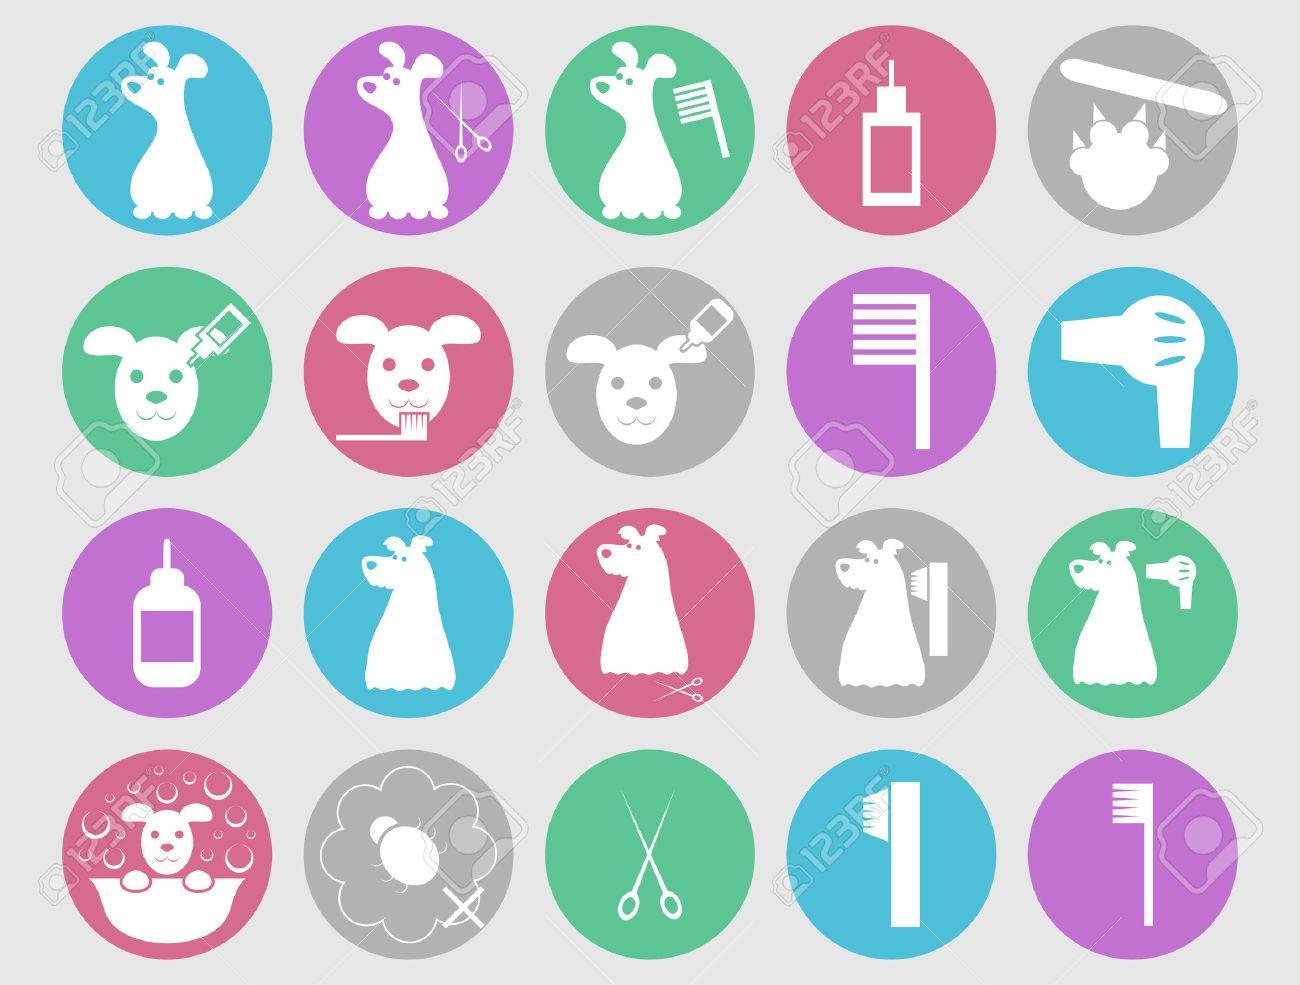 Dog grooming icons set - 34186316